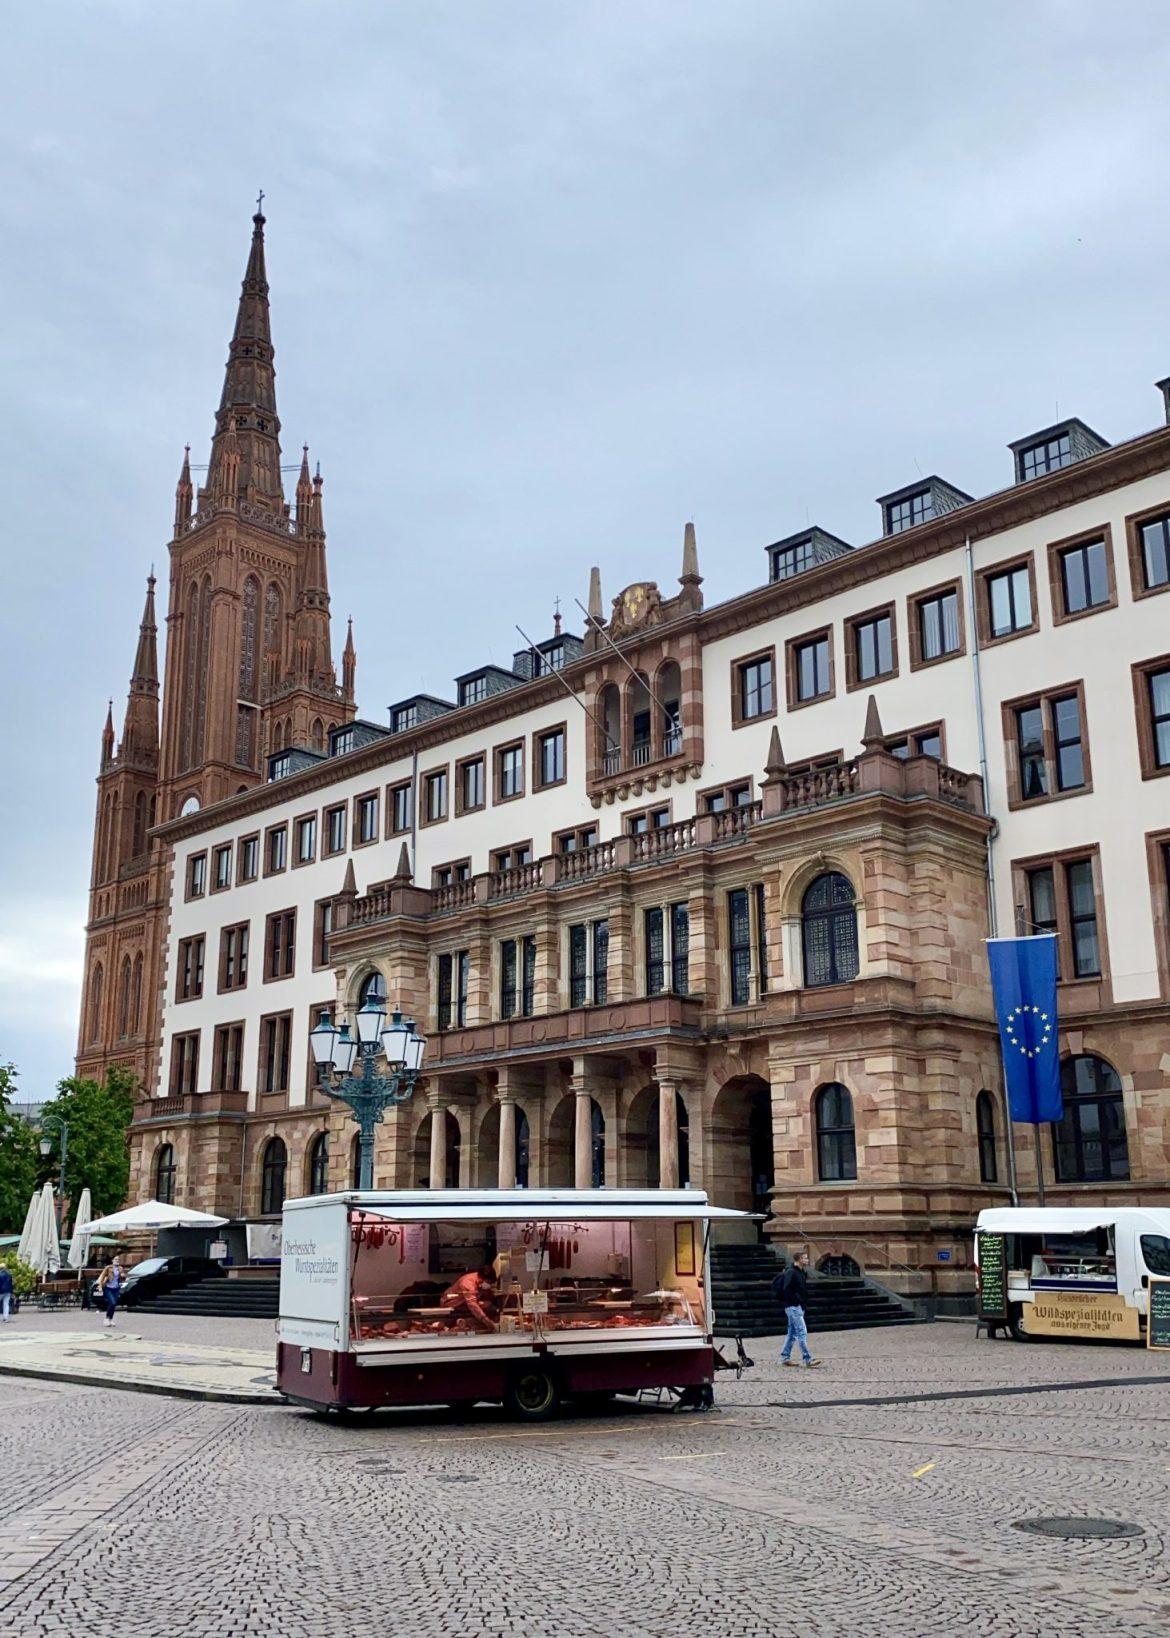 The Metzgerei Christ stand at the Wiesbaden Schlossplatz